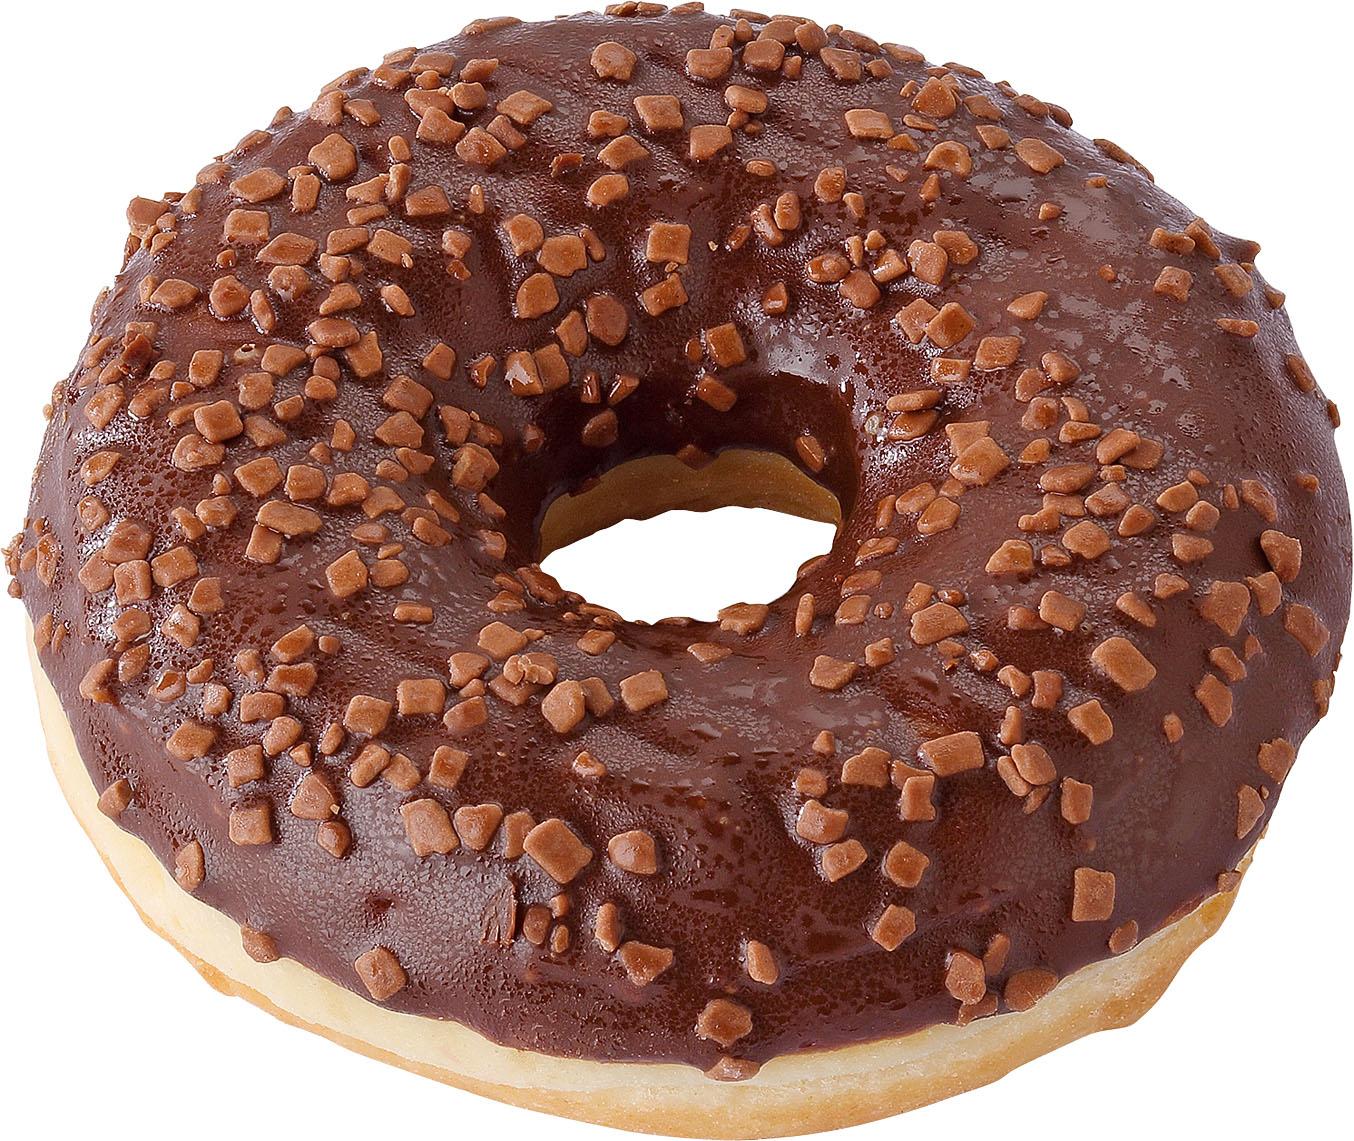 Kaufland Donuts 55-g-Stück 0,39 € statt 0,49 €